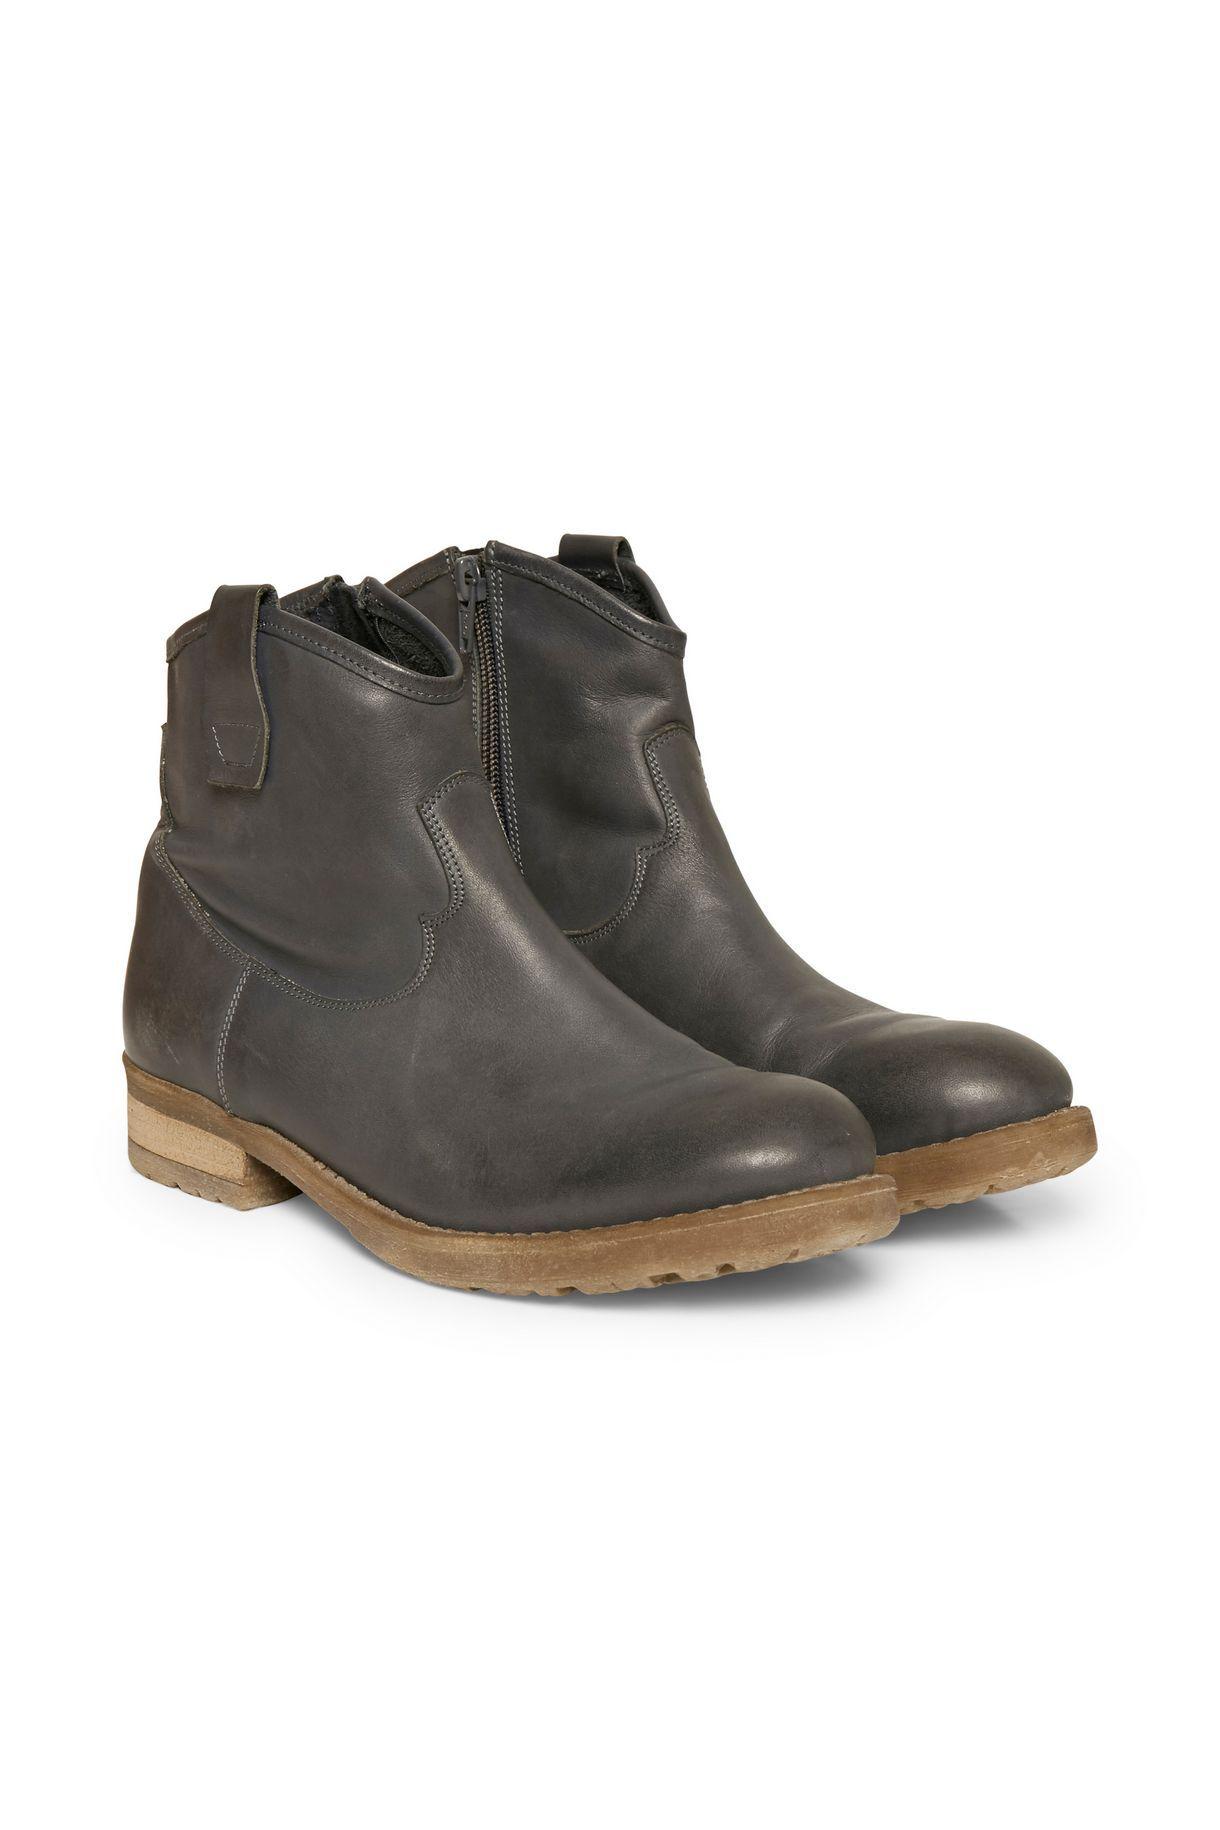 44ac18ec0a96 Grå Støvler fra Cream Accessories – Køb Grå Støvler fra str. 36-41 her